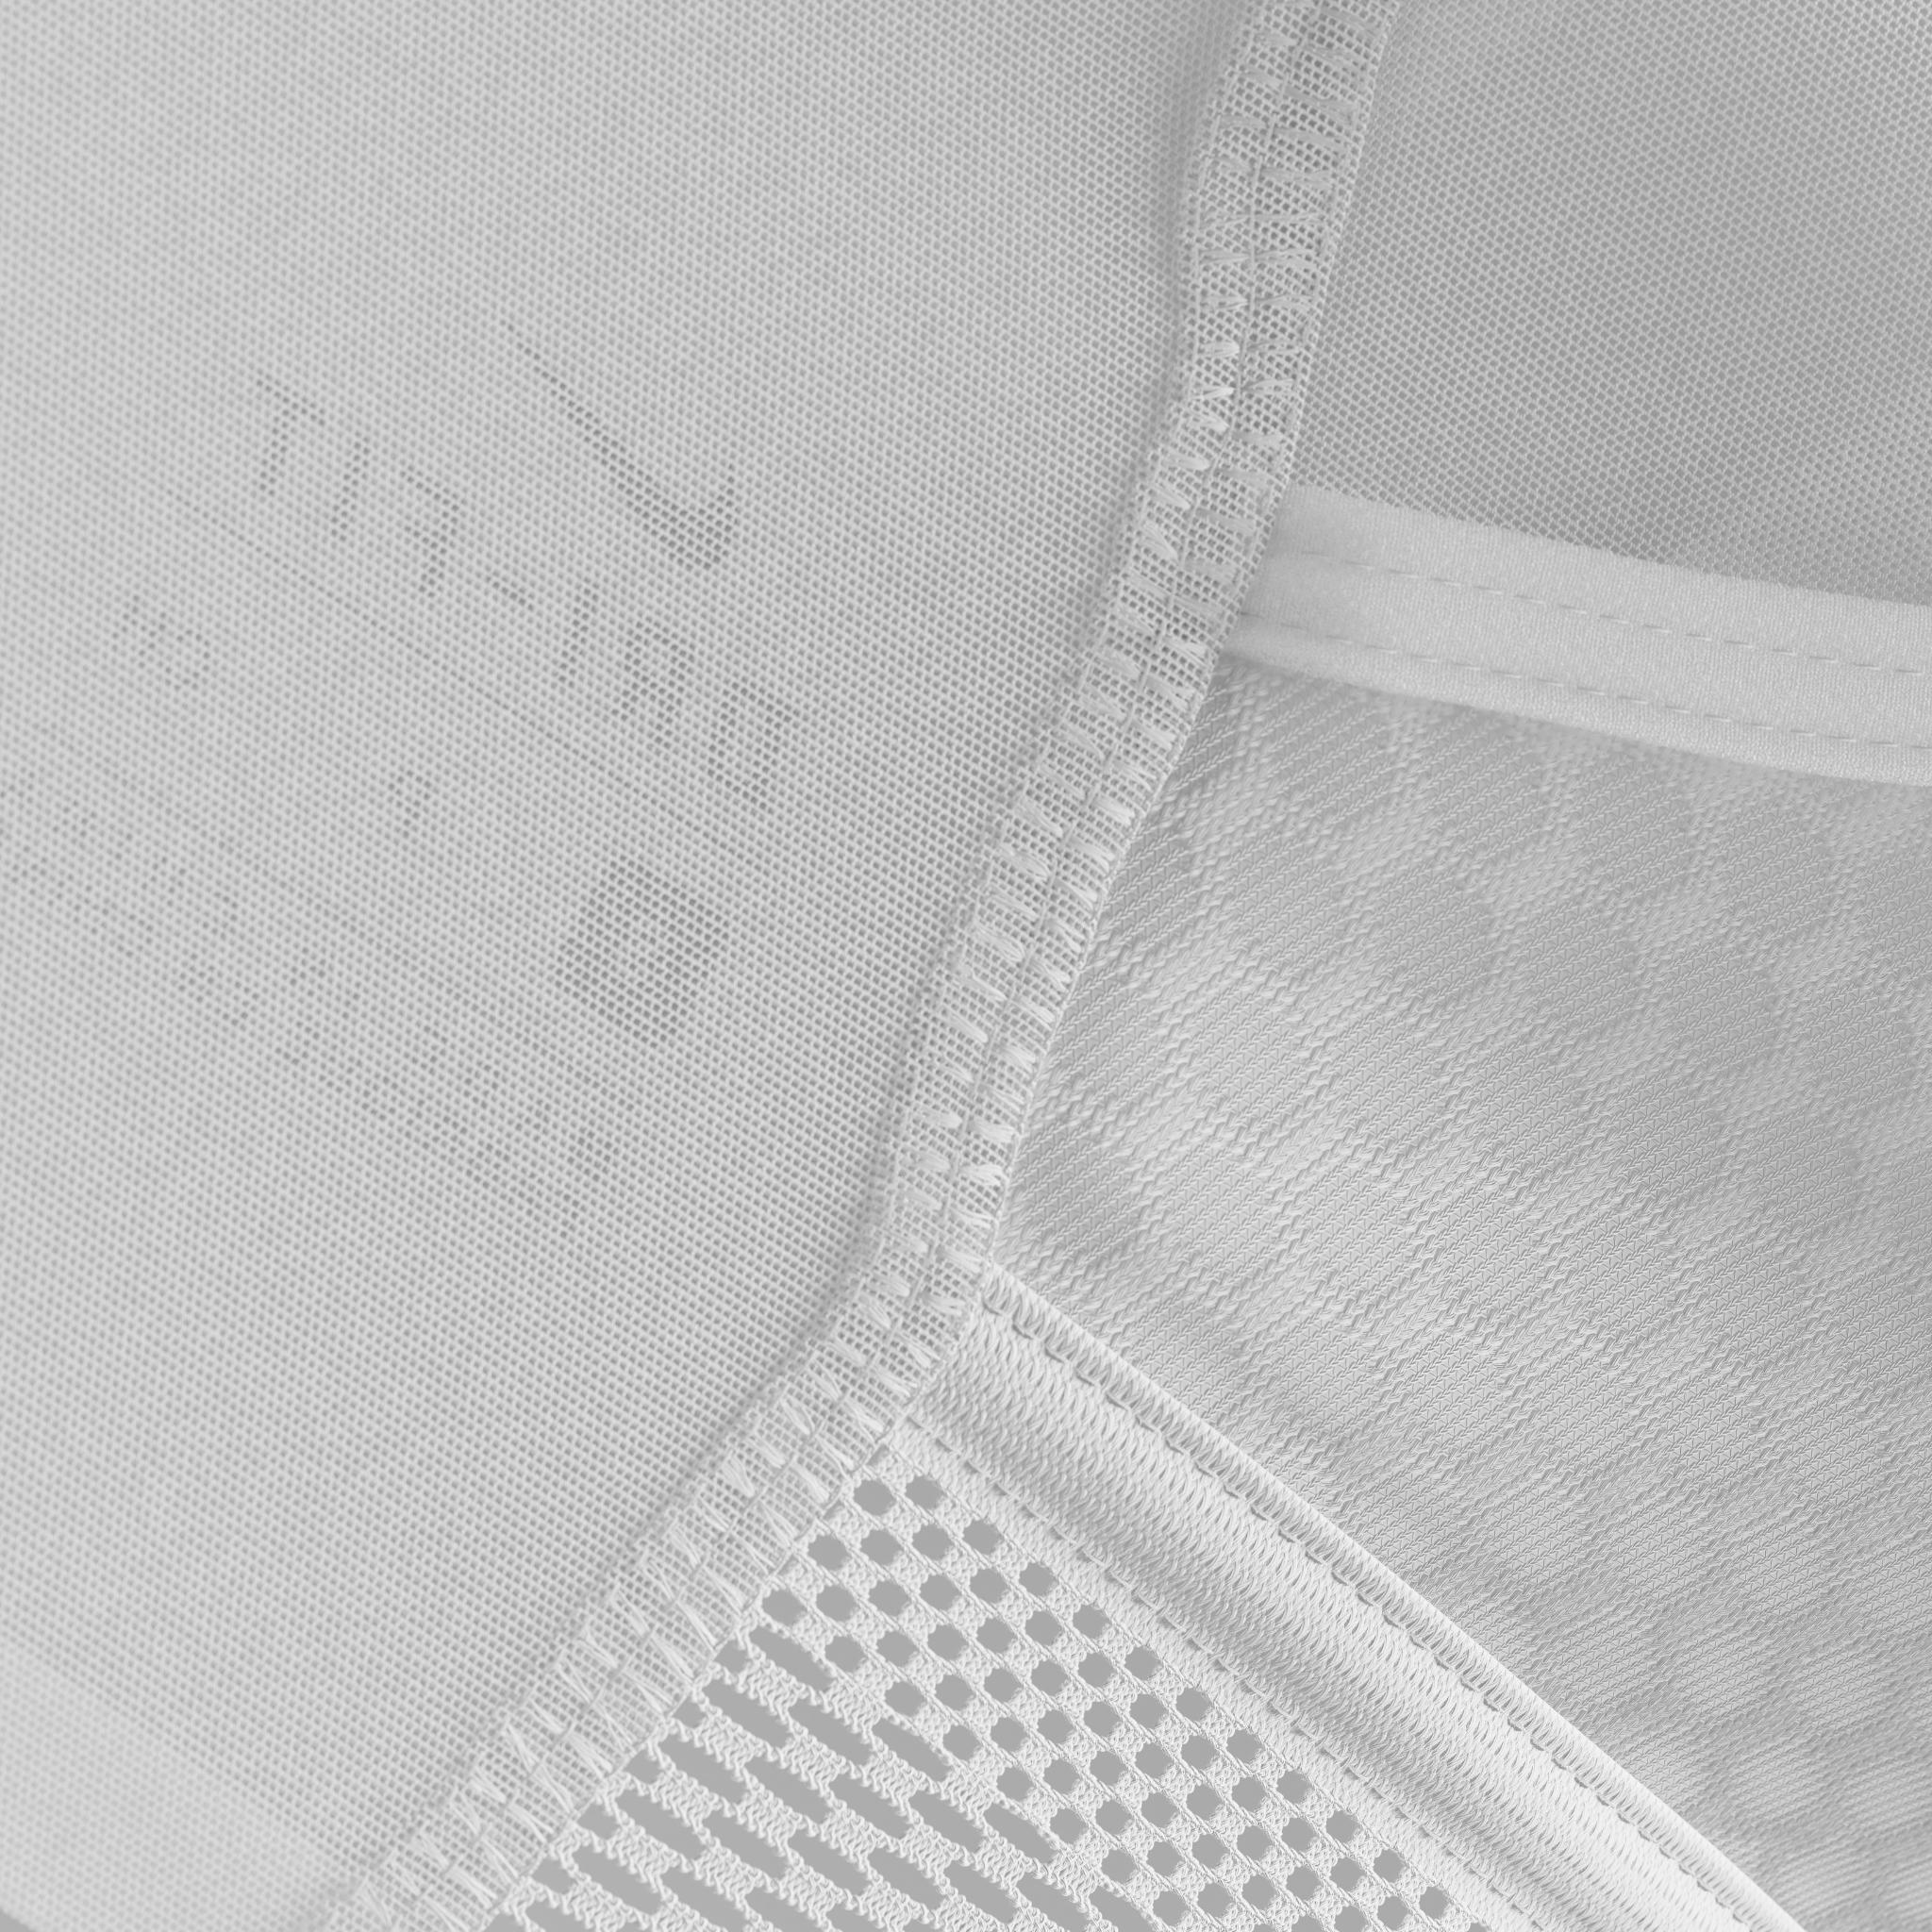 Nike_Ultrabreathe_Bra_Indy_White_Macro_02_2K